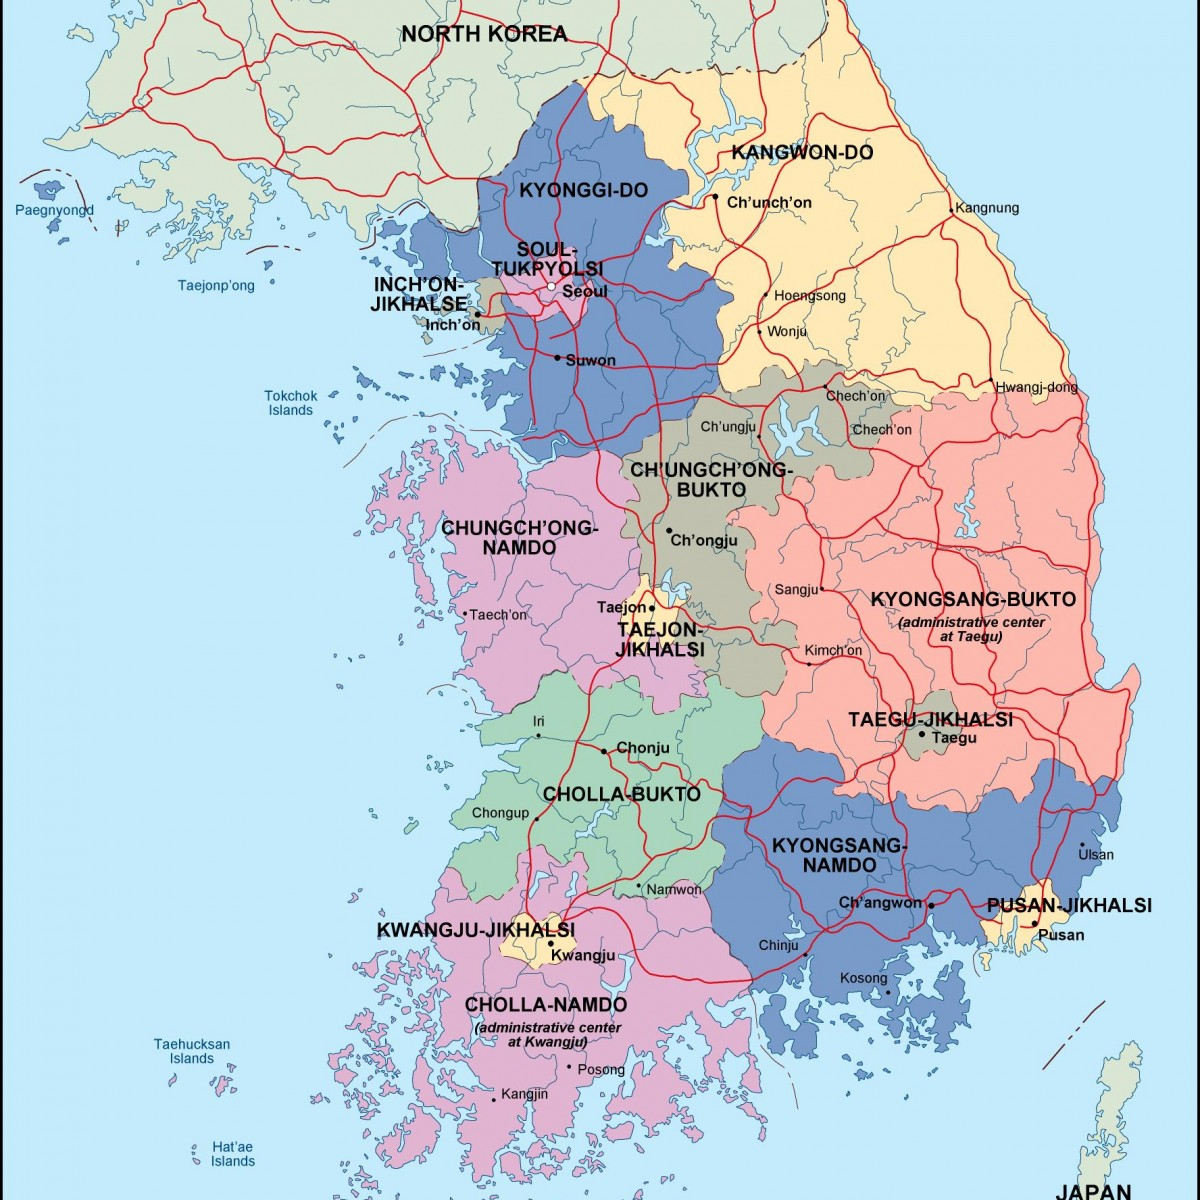 Map Of South Korean Cities South Korea Maps | Printable Maps of South Korea for Download